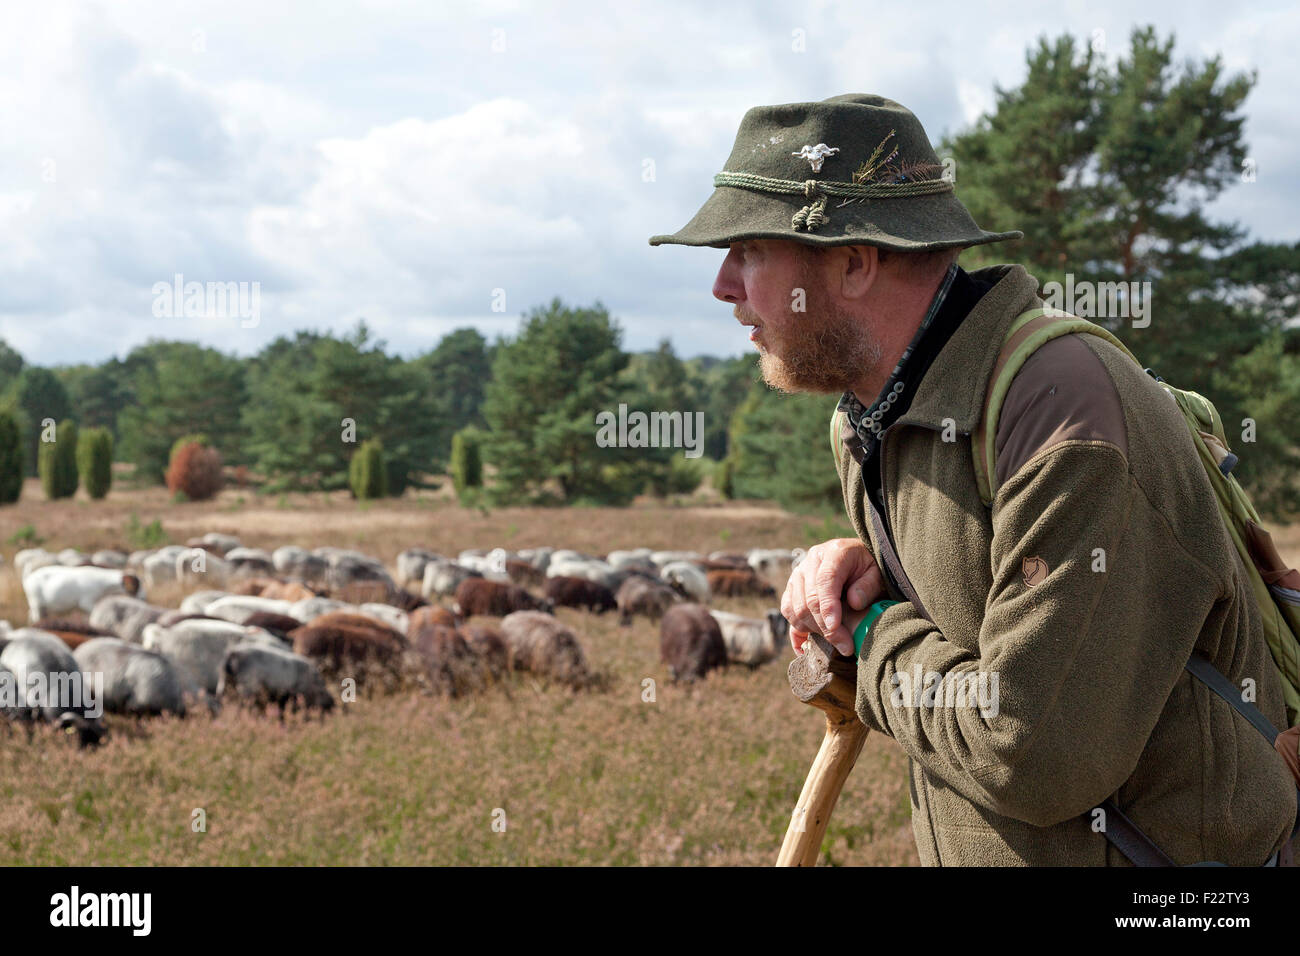 shepherd with his sheep, Lueneburg Heath near Wilsede, Lower Saxony, Germany - Stock Image